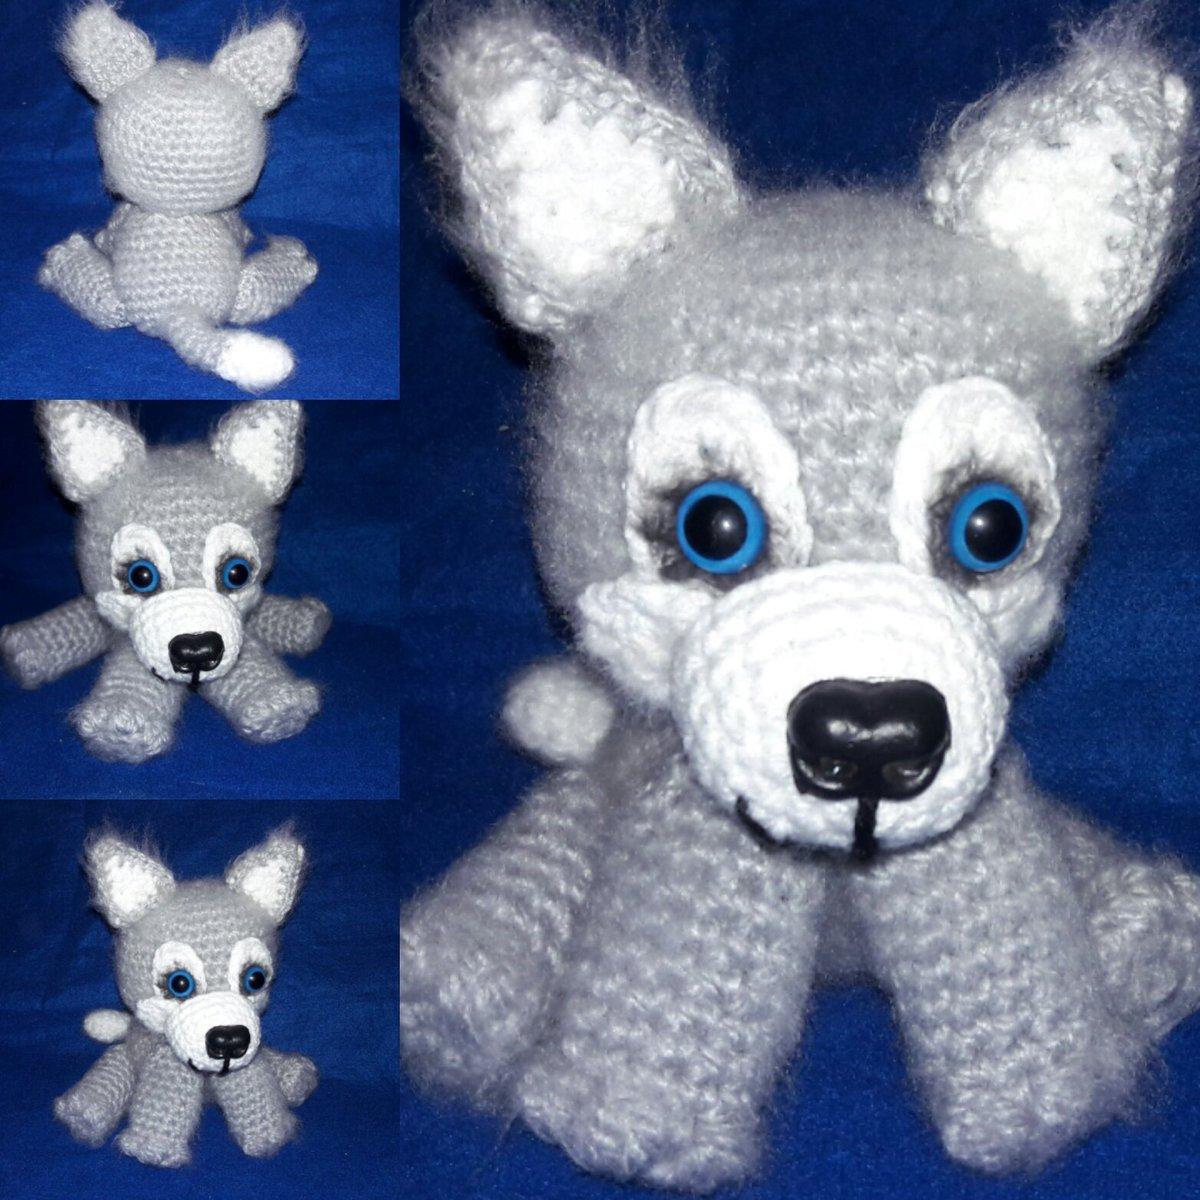 Amigurumi Husky Beret Free Crochet Pattern - Crochet Pic2re | 1200x1200